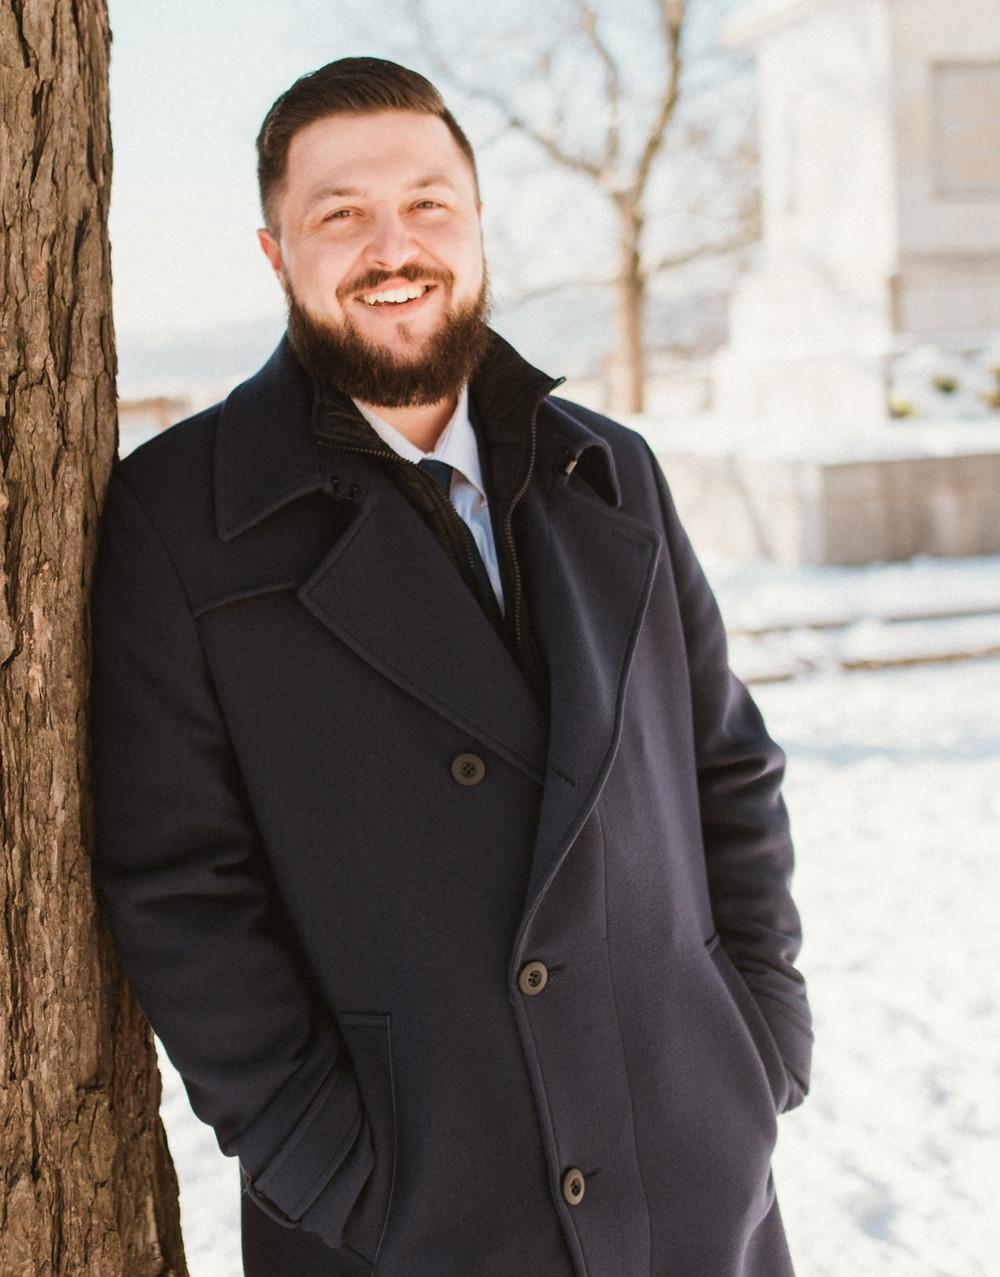 Antoine Bath e-minent founder photoshoot made in Brno